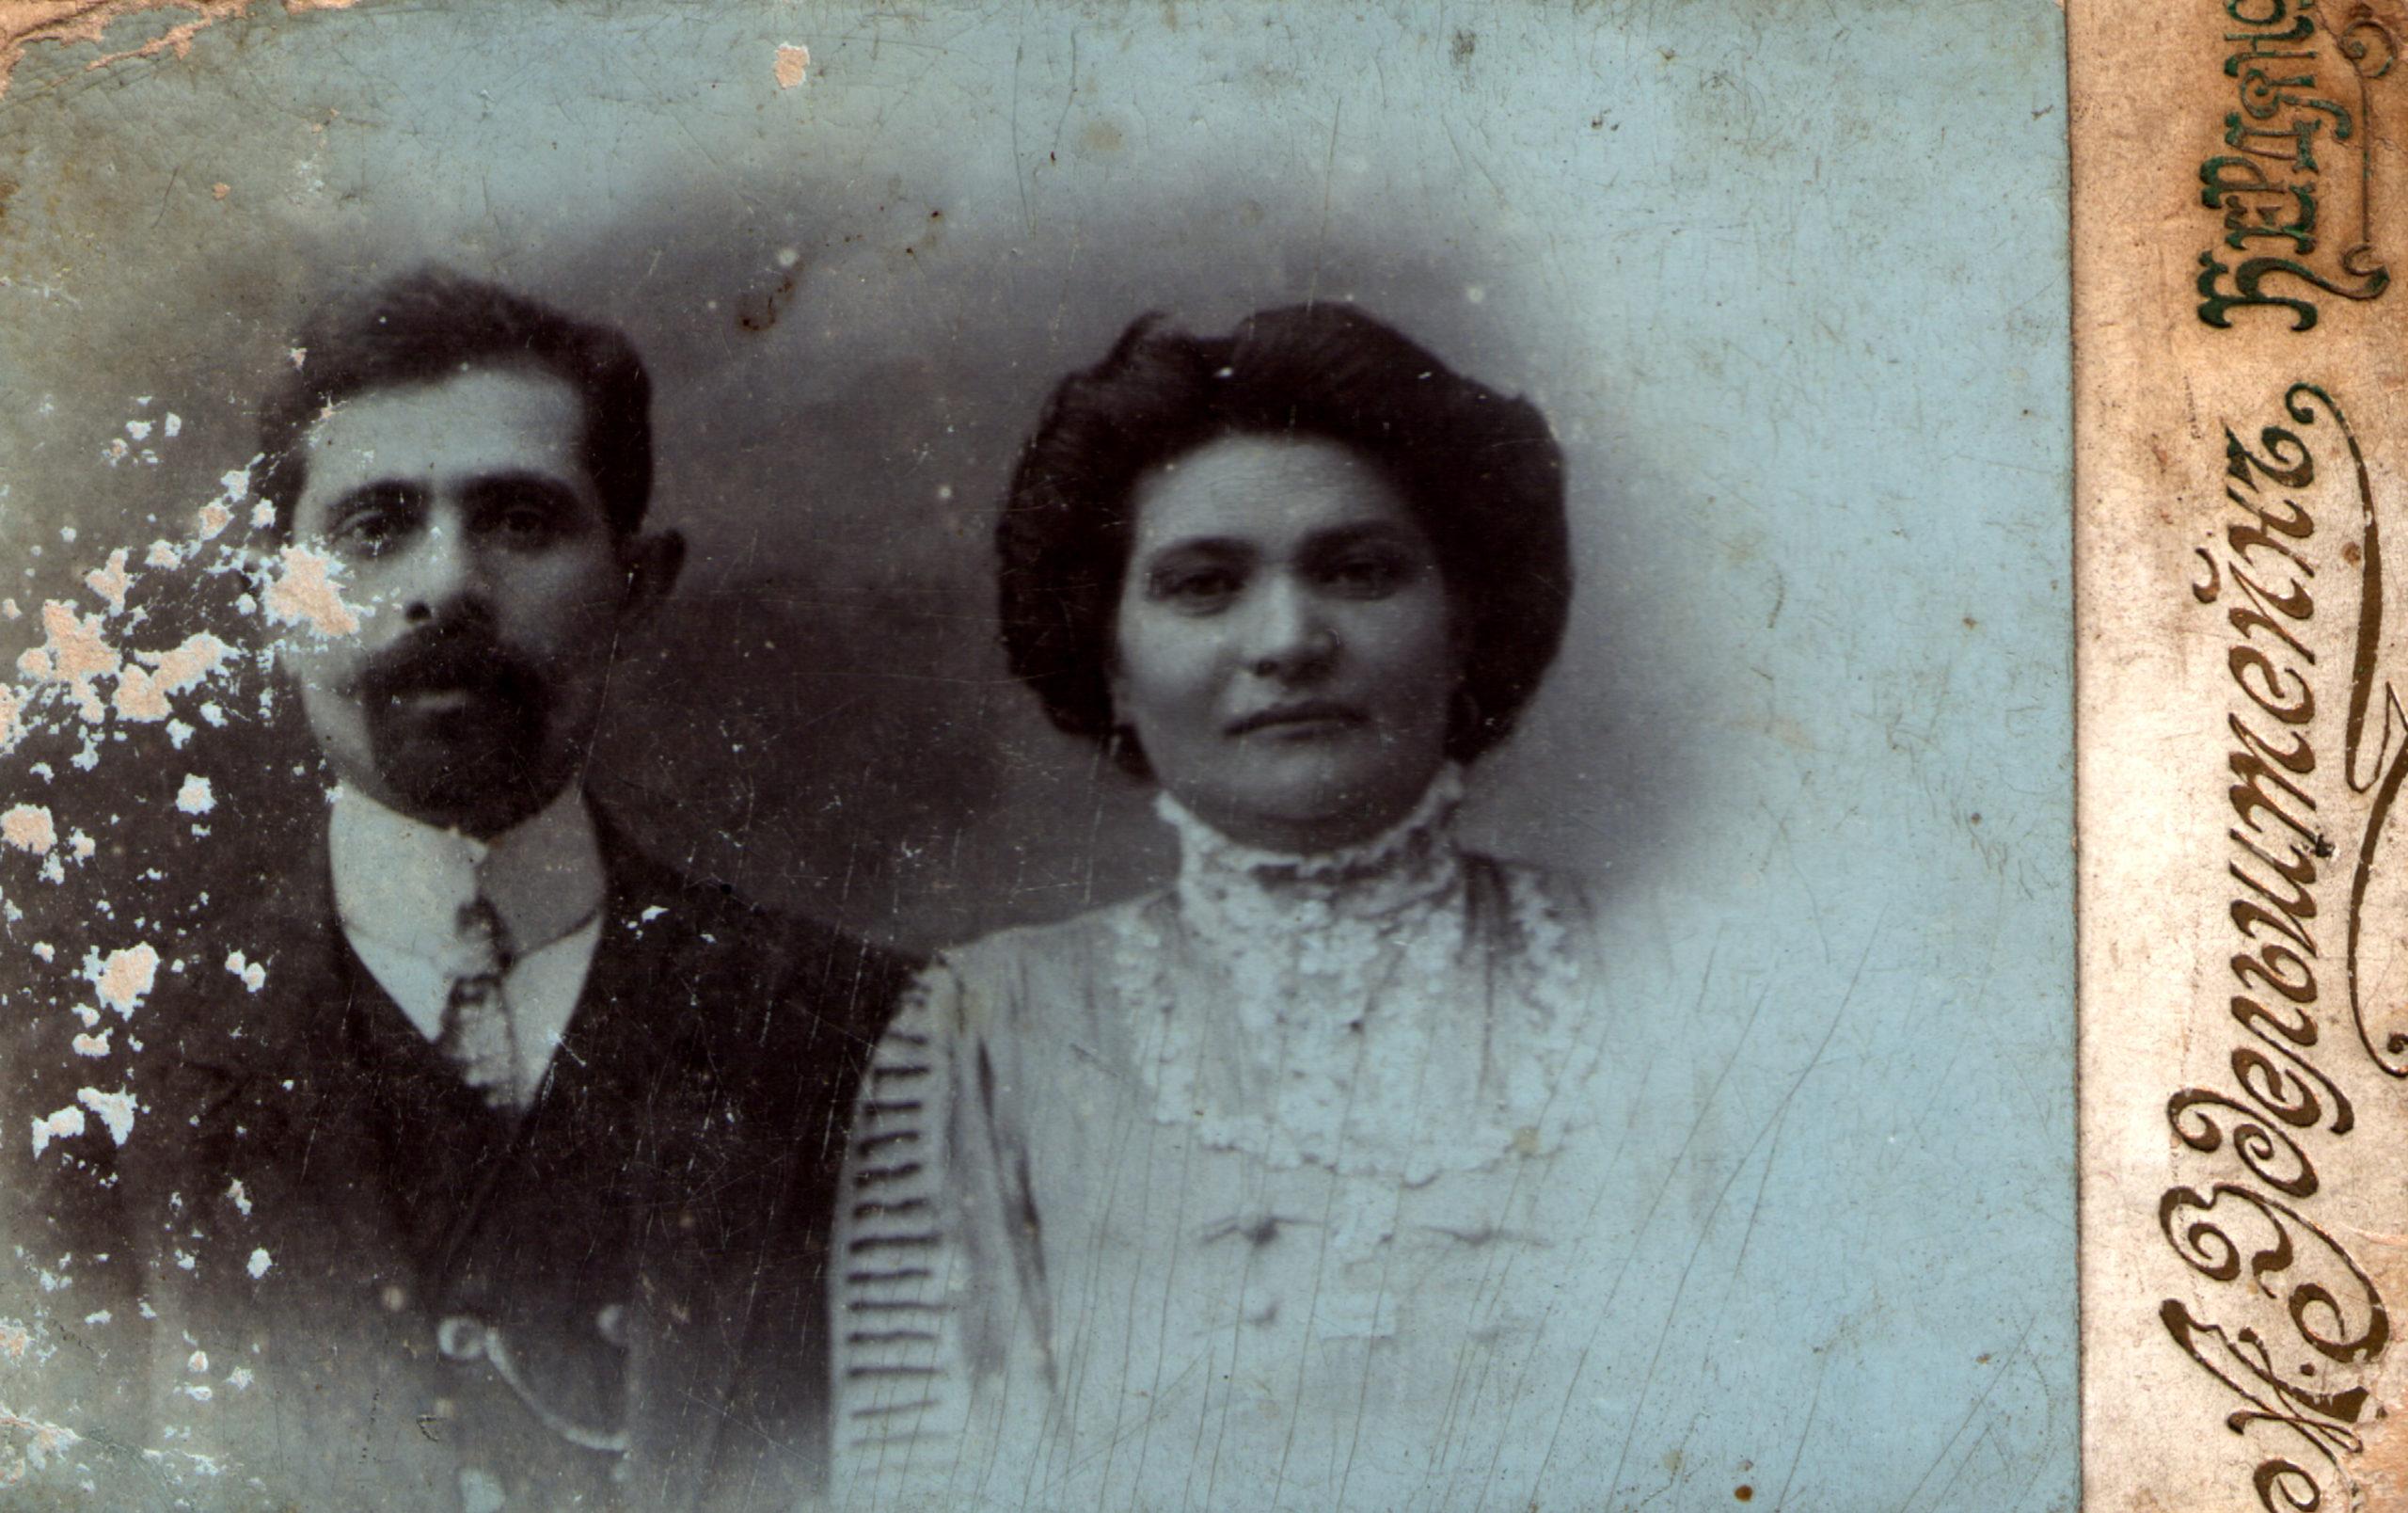 Rena Reinova and her husband Haim Reinov